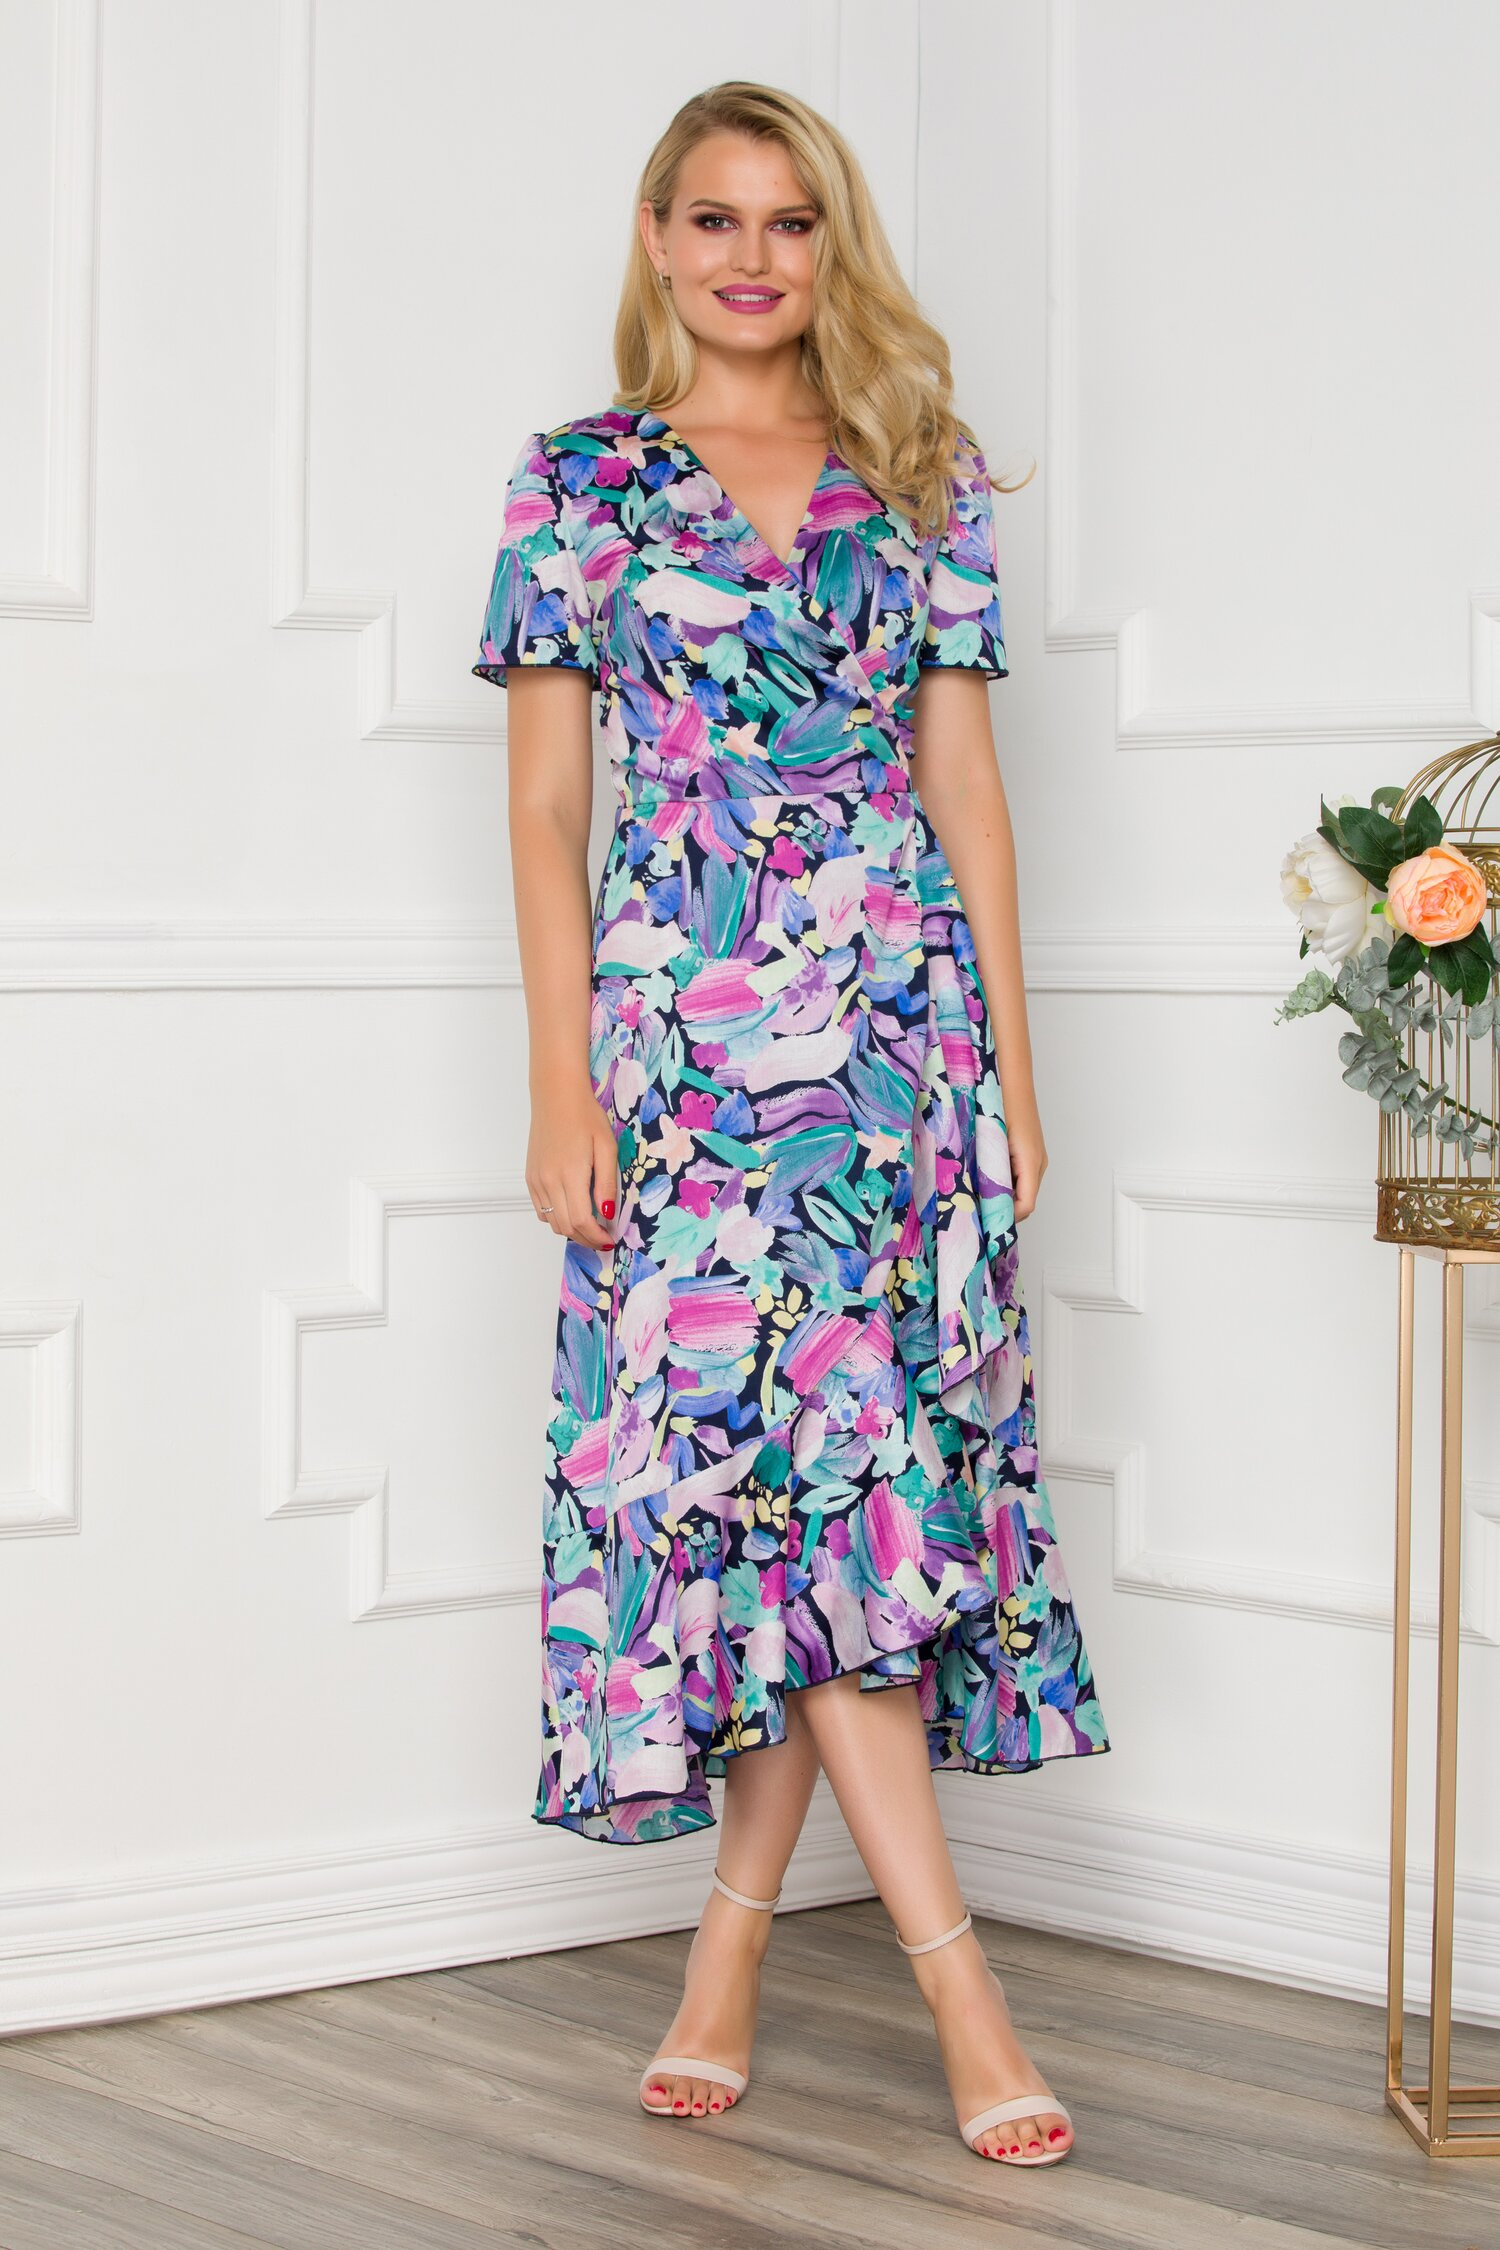 Rochie midi petrecuta bleumarin cu imprimeuri florale in nuante pastelate